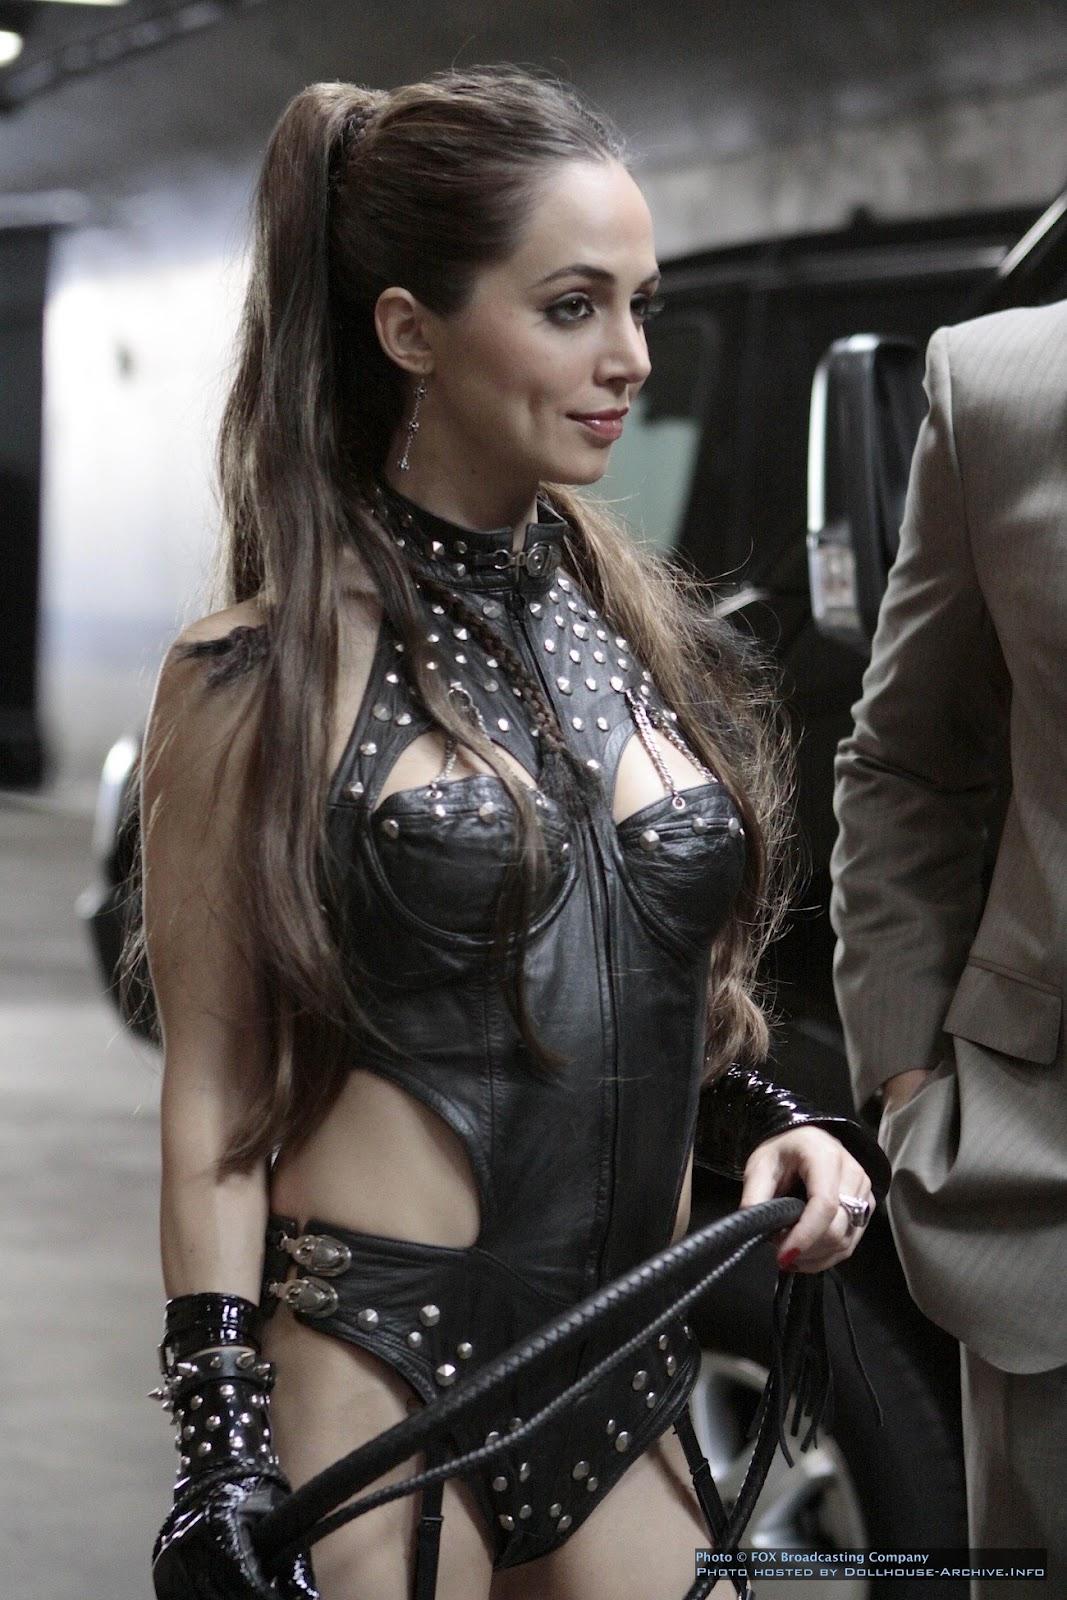 http://3.bp.blogspot.com/-XmKUNDrh1uU/T_d-L5diLSI/AAAAAAAAHsc/3D4QBTzxurs/s1600/Eliza-dushku-leather_dollhouse_echo.jpg